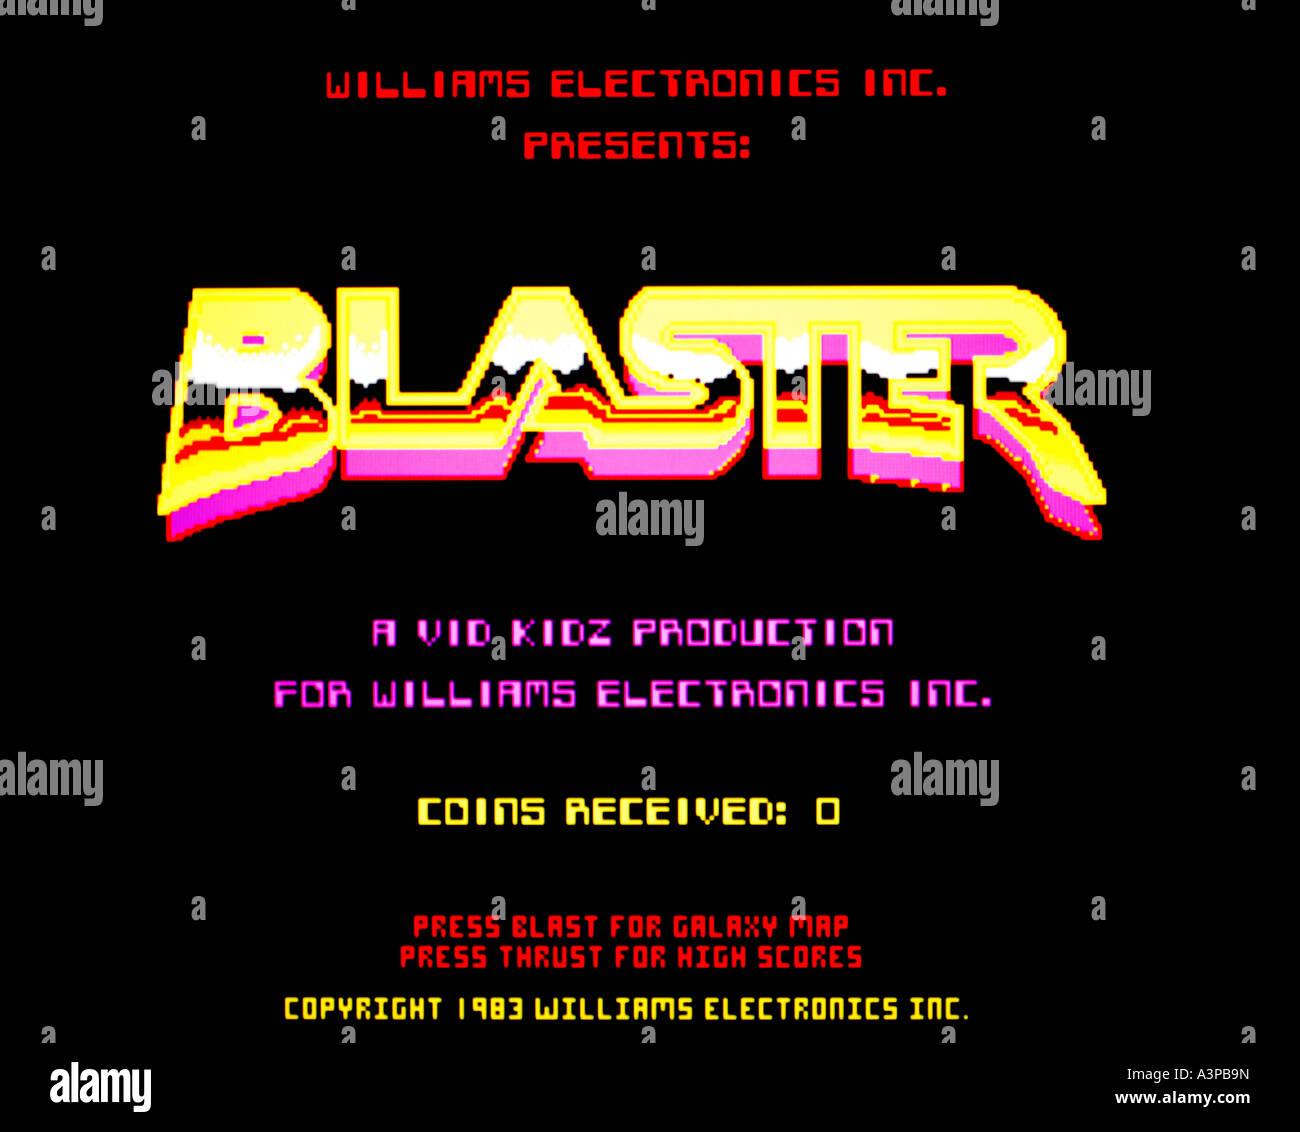 Blaster Williams Electronics Ltd 1983 vintage arcade